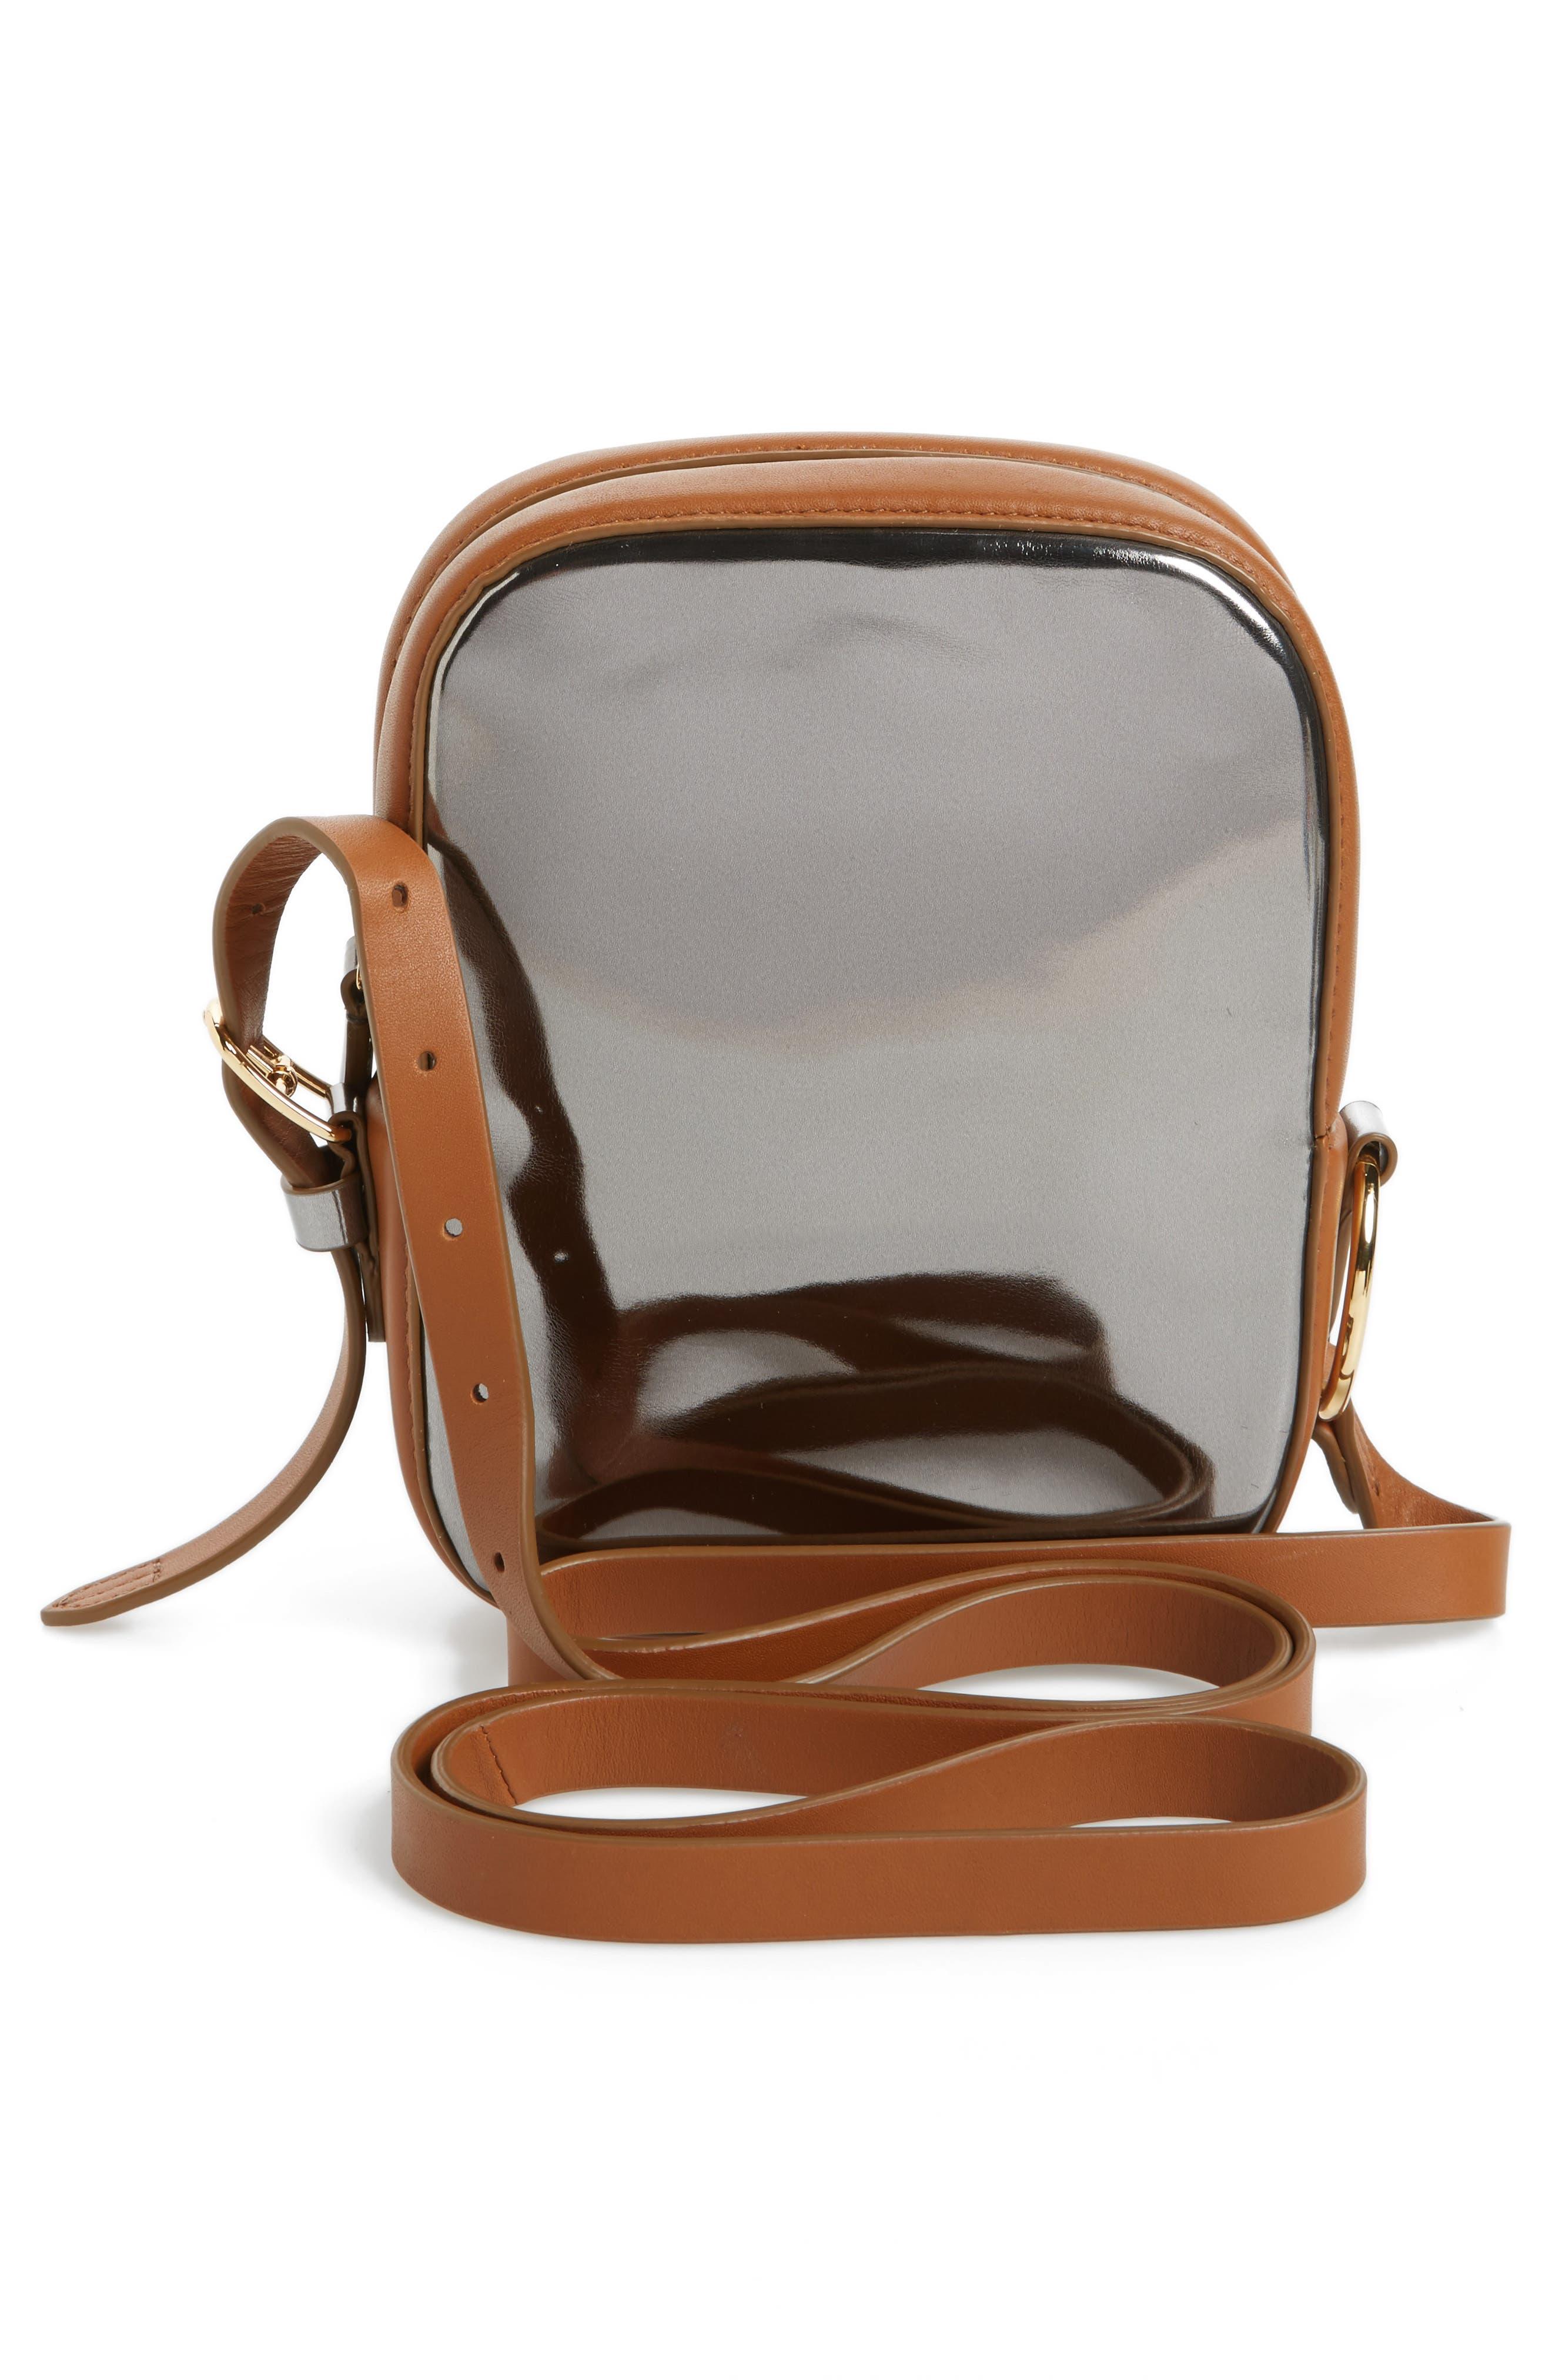 Specchio Leather Camera Bag,                             Alternate thumbnail 3, color,                             040